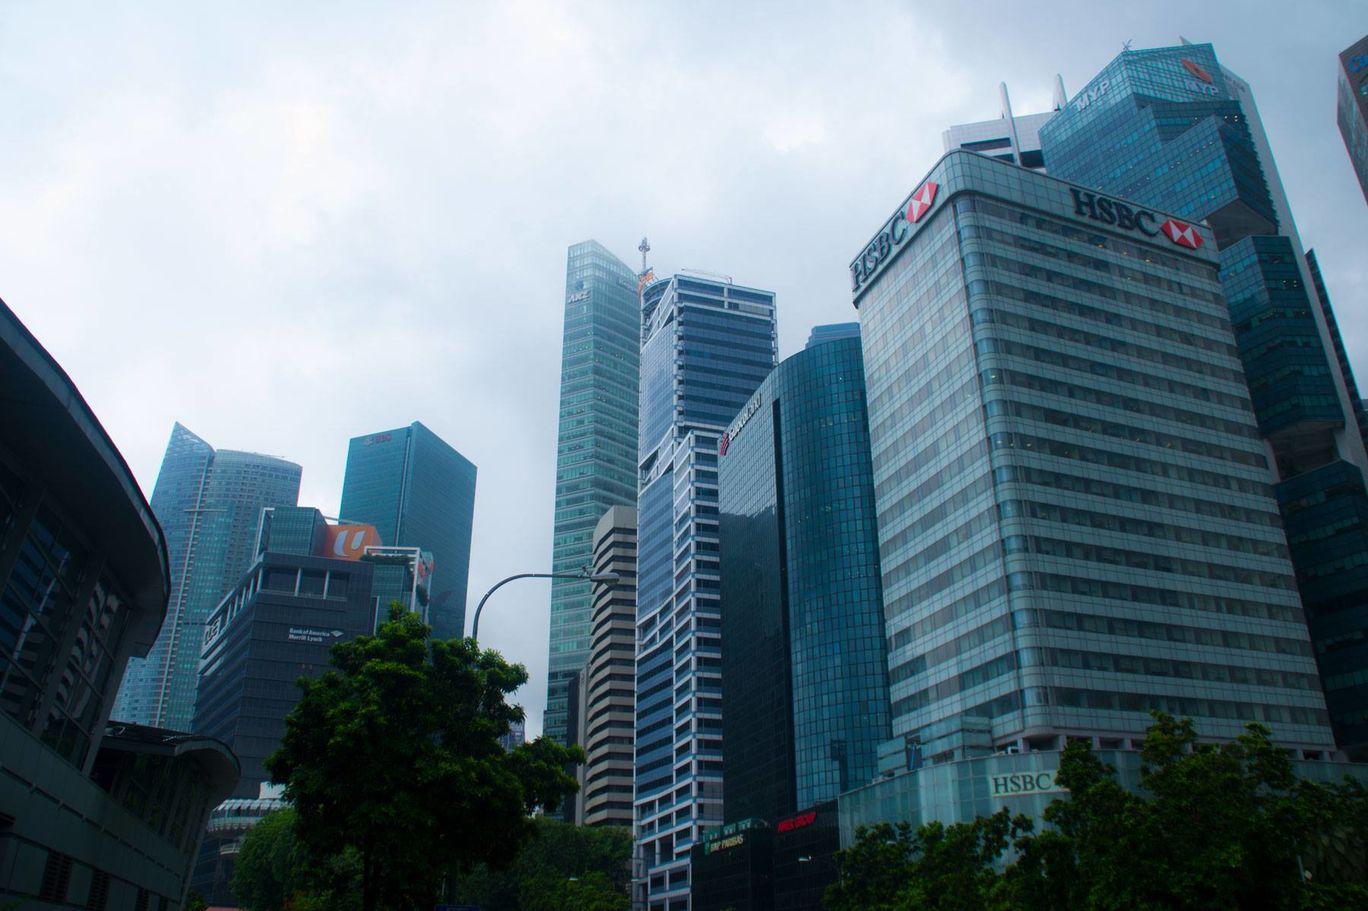 Photo of Singapore By Raviteja Govindaraju